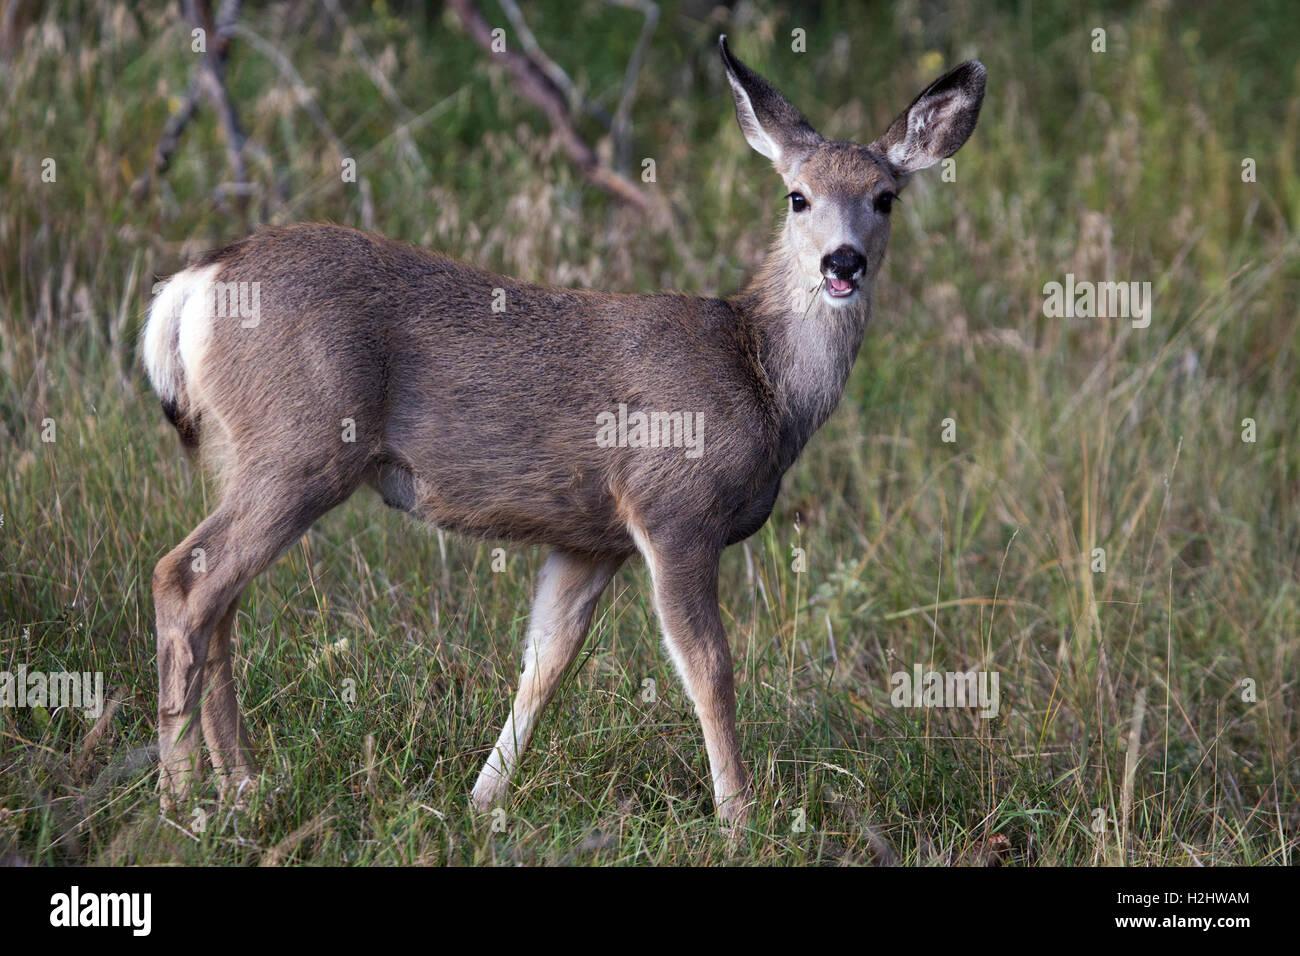 Mule deer doe (Odocoileus hemionus) in wildlife sanctuary Stock Photo